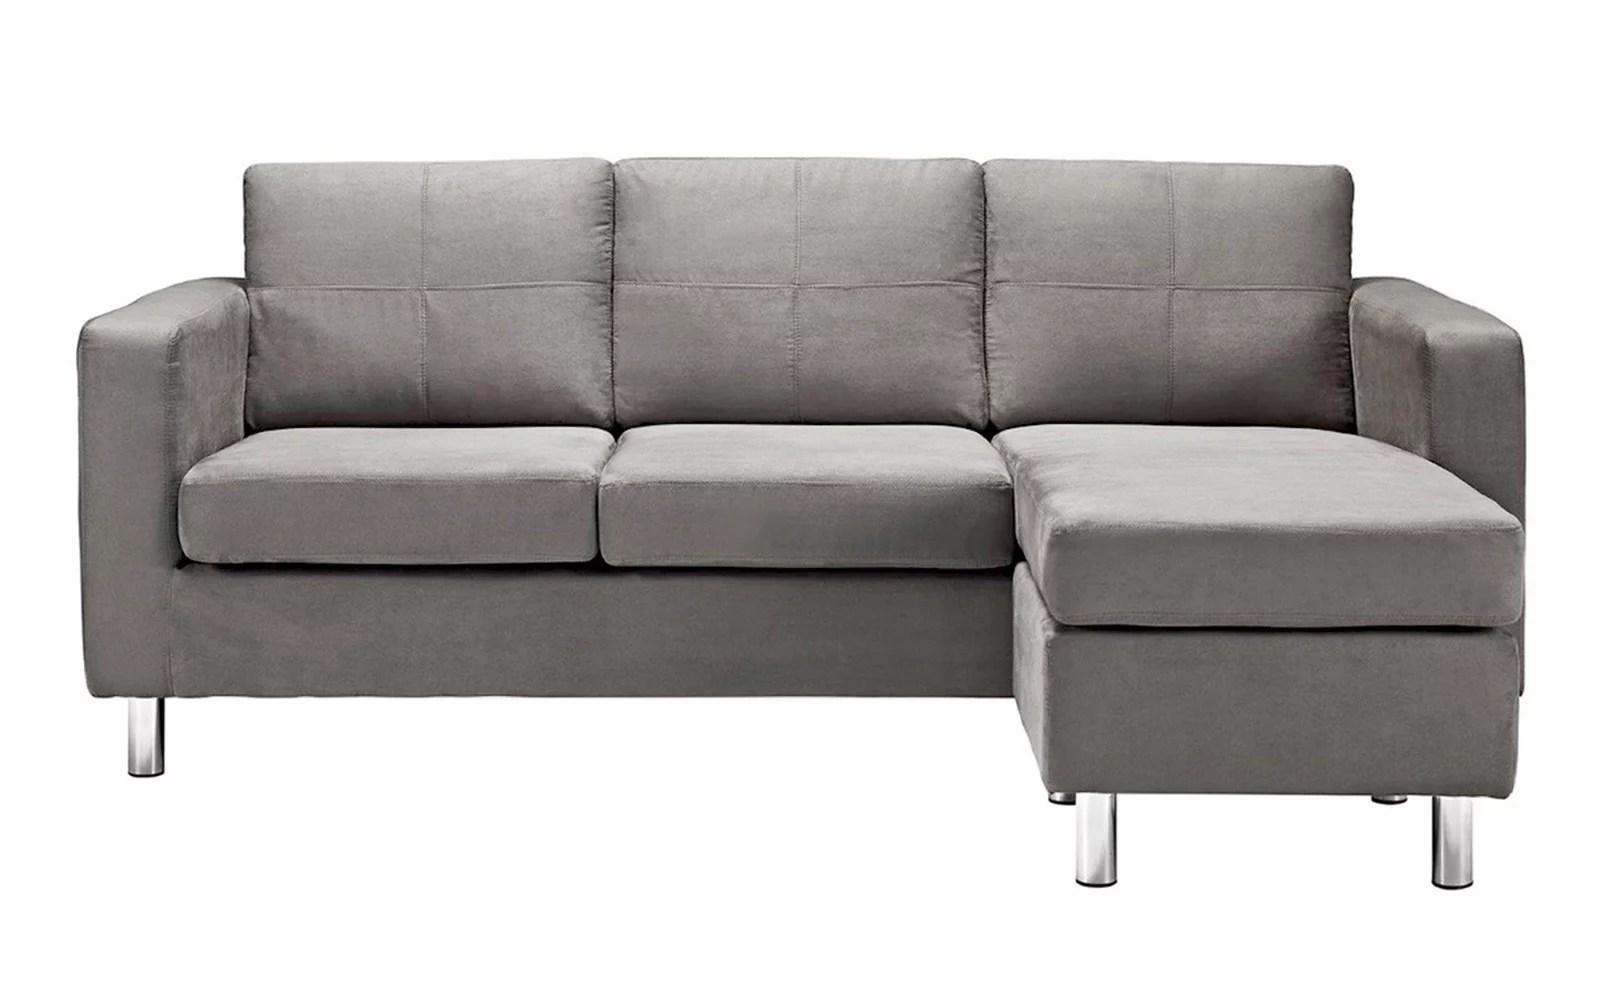 casa andrea milano sectional sofa deep red corner modern reversible small space configurable microfiber ...